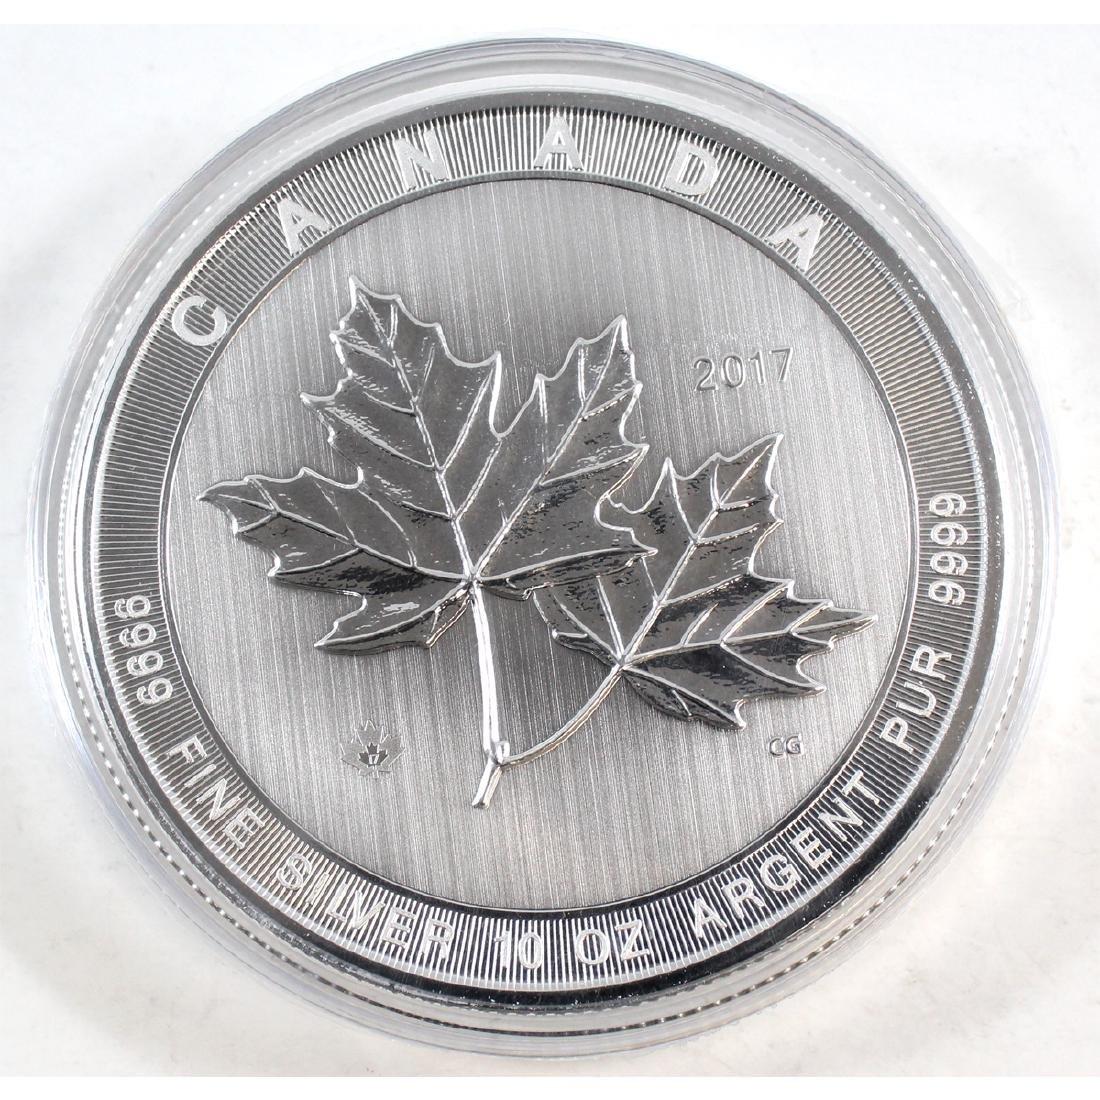 2017 Canada $50 Magnificent Maple Leaves 10oz Fine